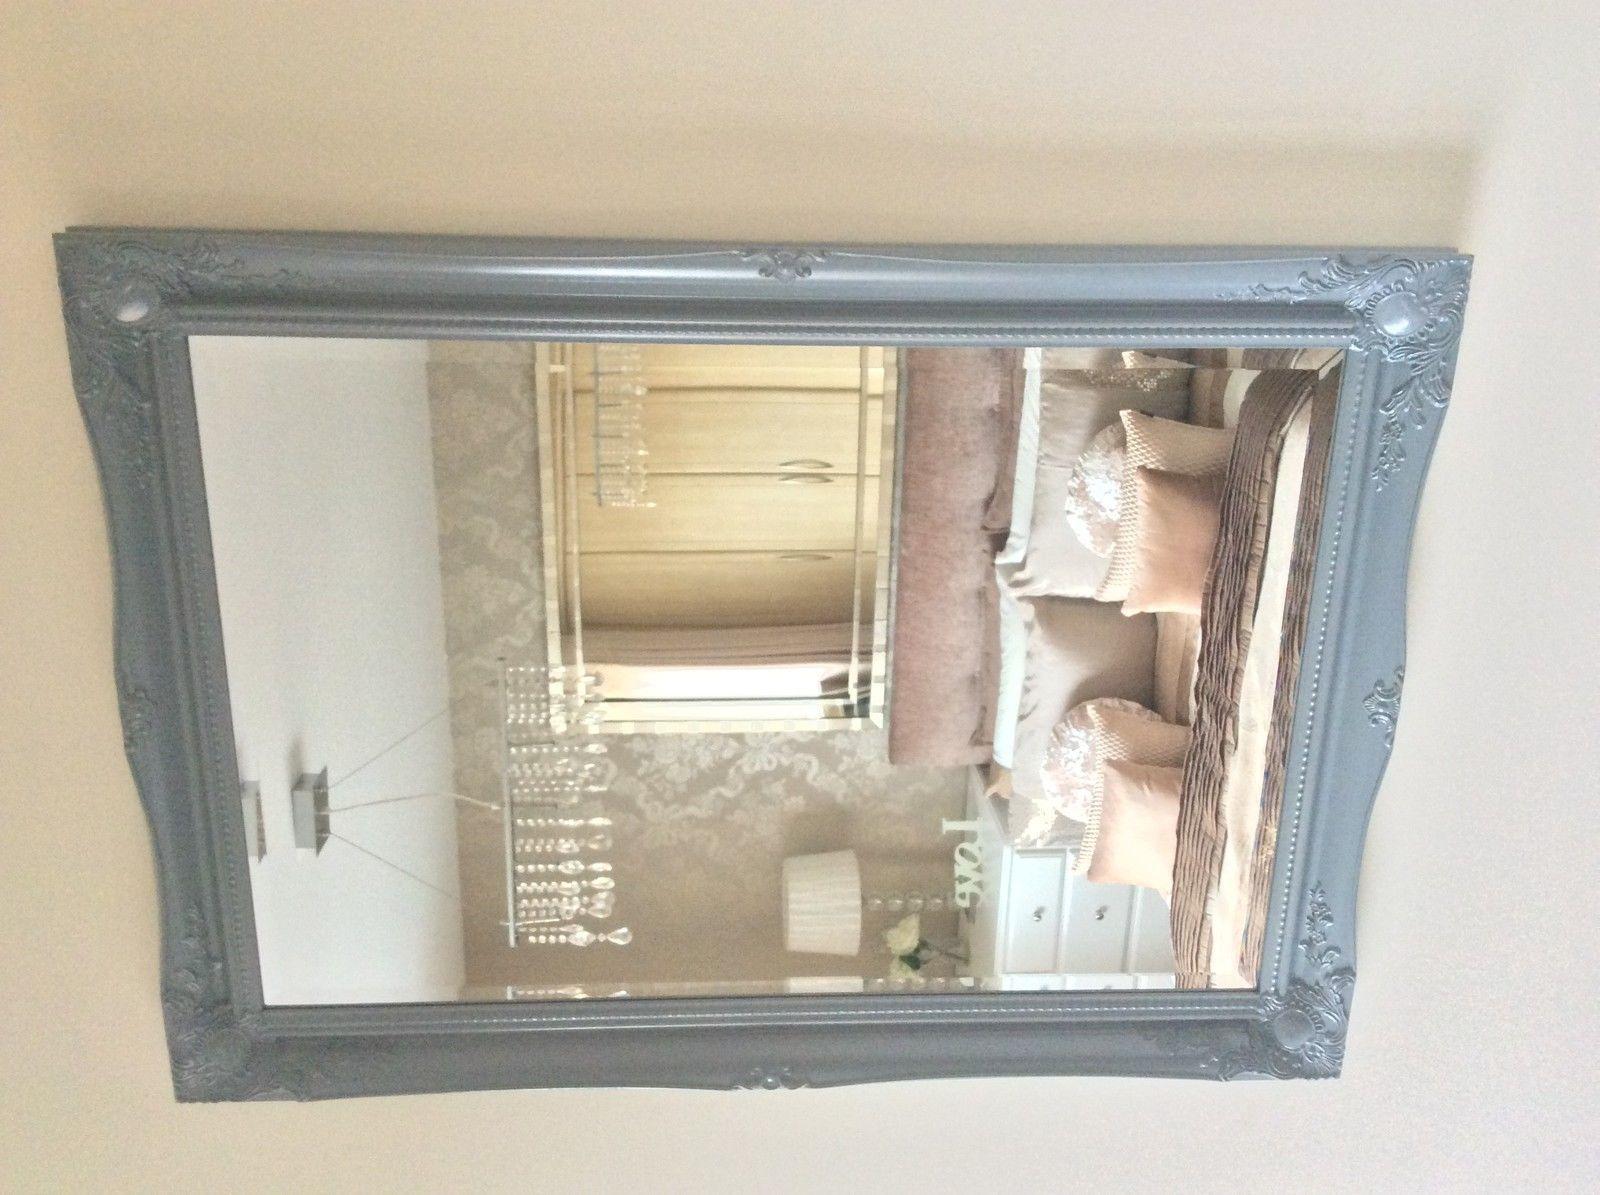 Large GREY Shabby Chic Ornate Decorative Wall Mirror FREE